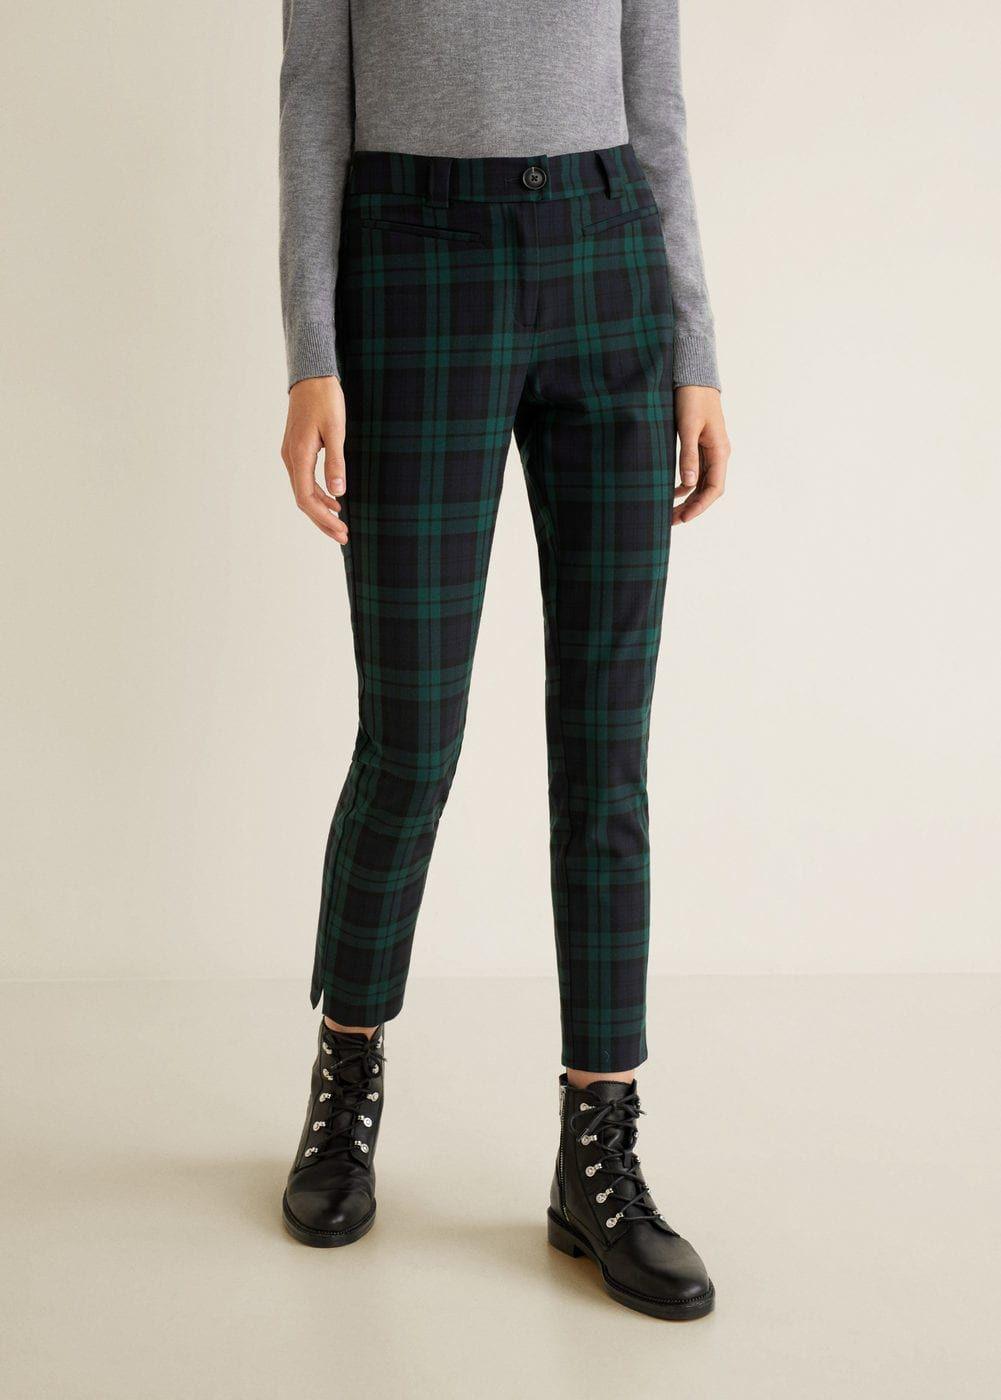 Straight checked pants - Women | Pantalones de cuadros, Pantalones